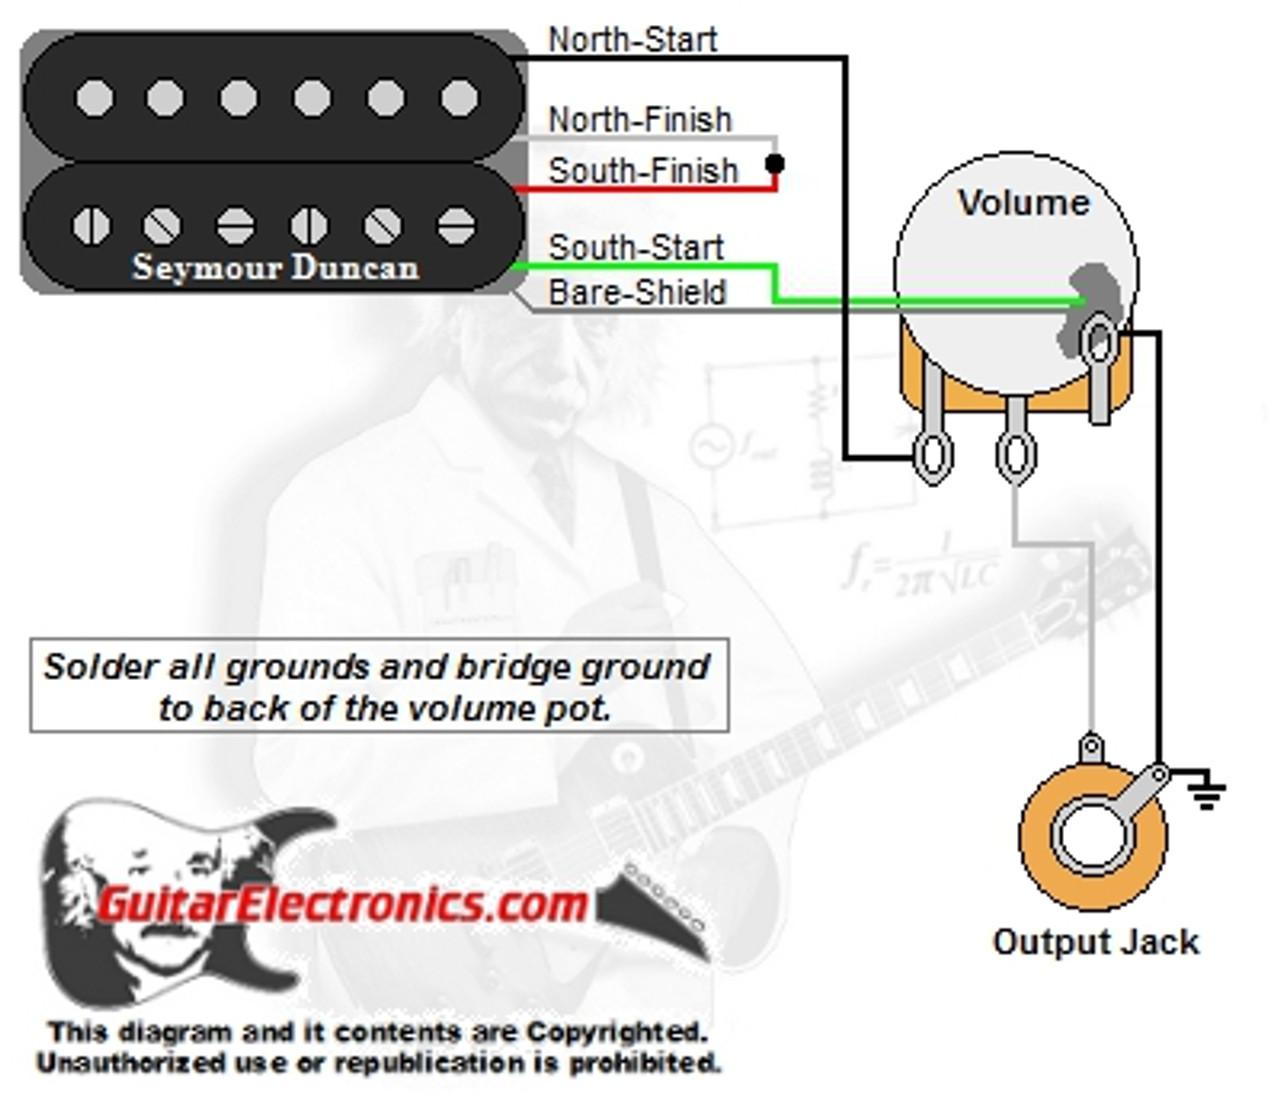 1 Humbucker/1 Volume | With Diagram For Humbucker Wiring Volume Control |  | Guitar Electronics